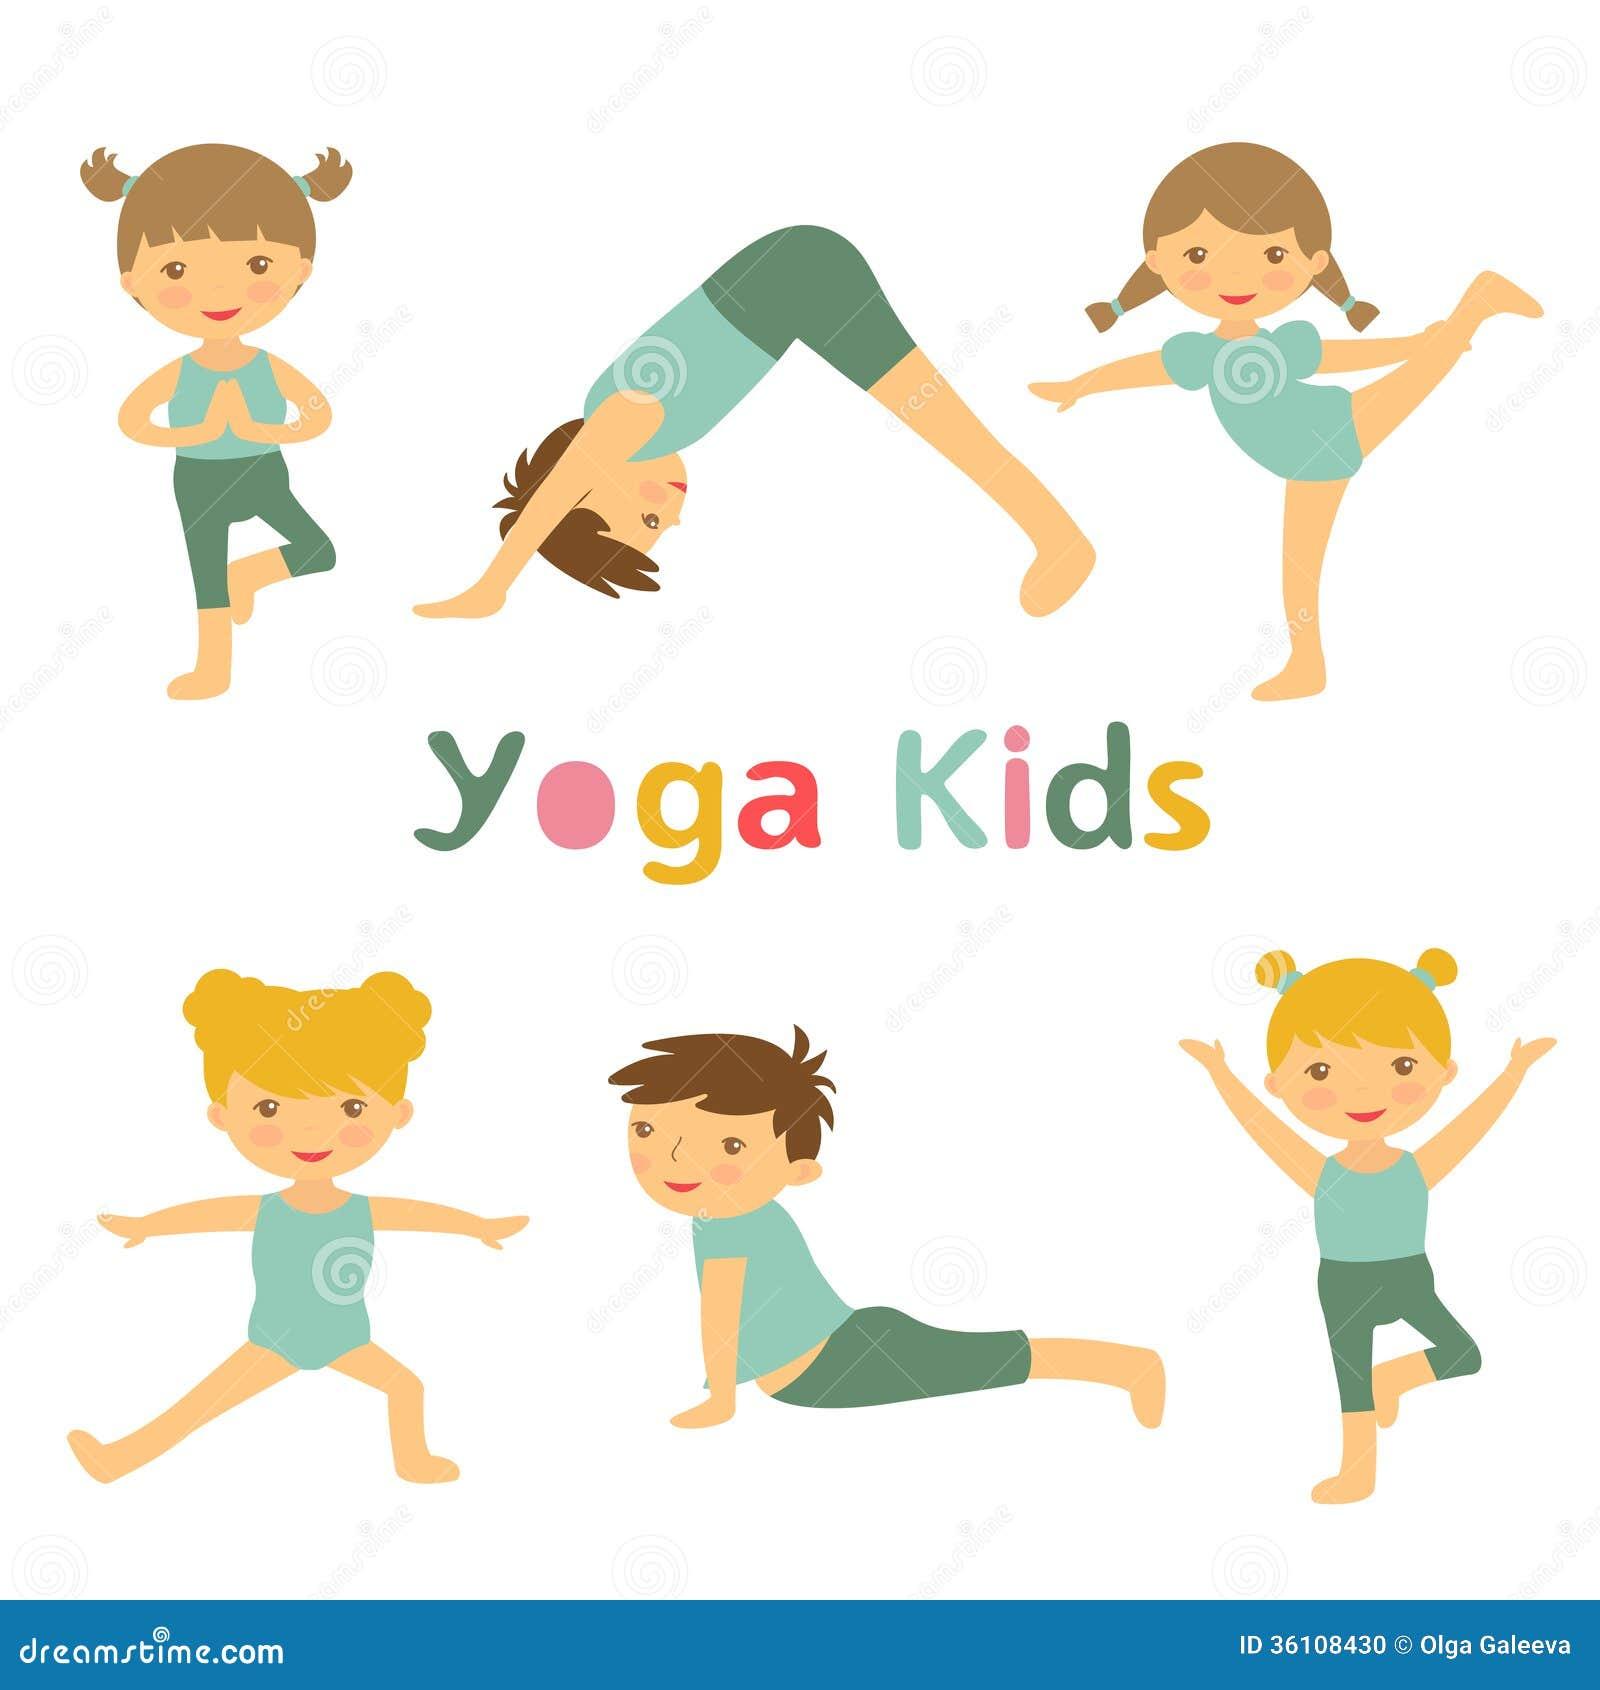 Yoga Kids Stock Photo - Image: 36108430